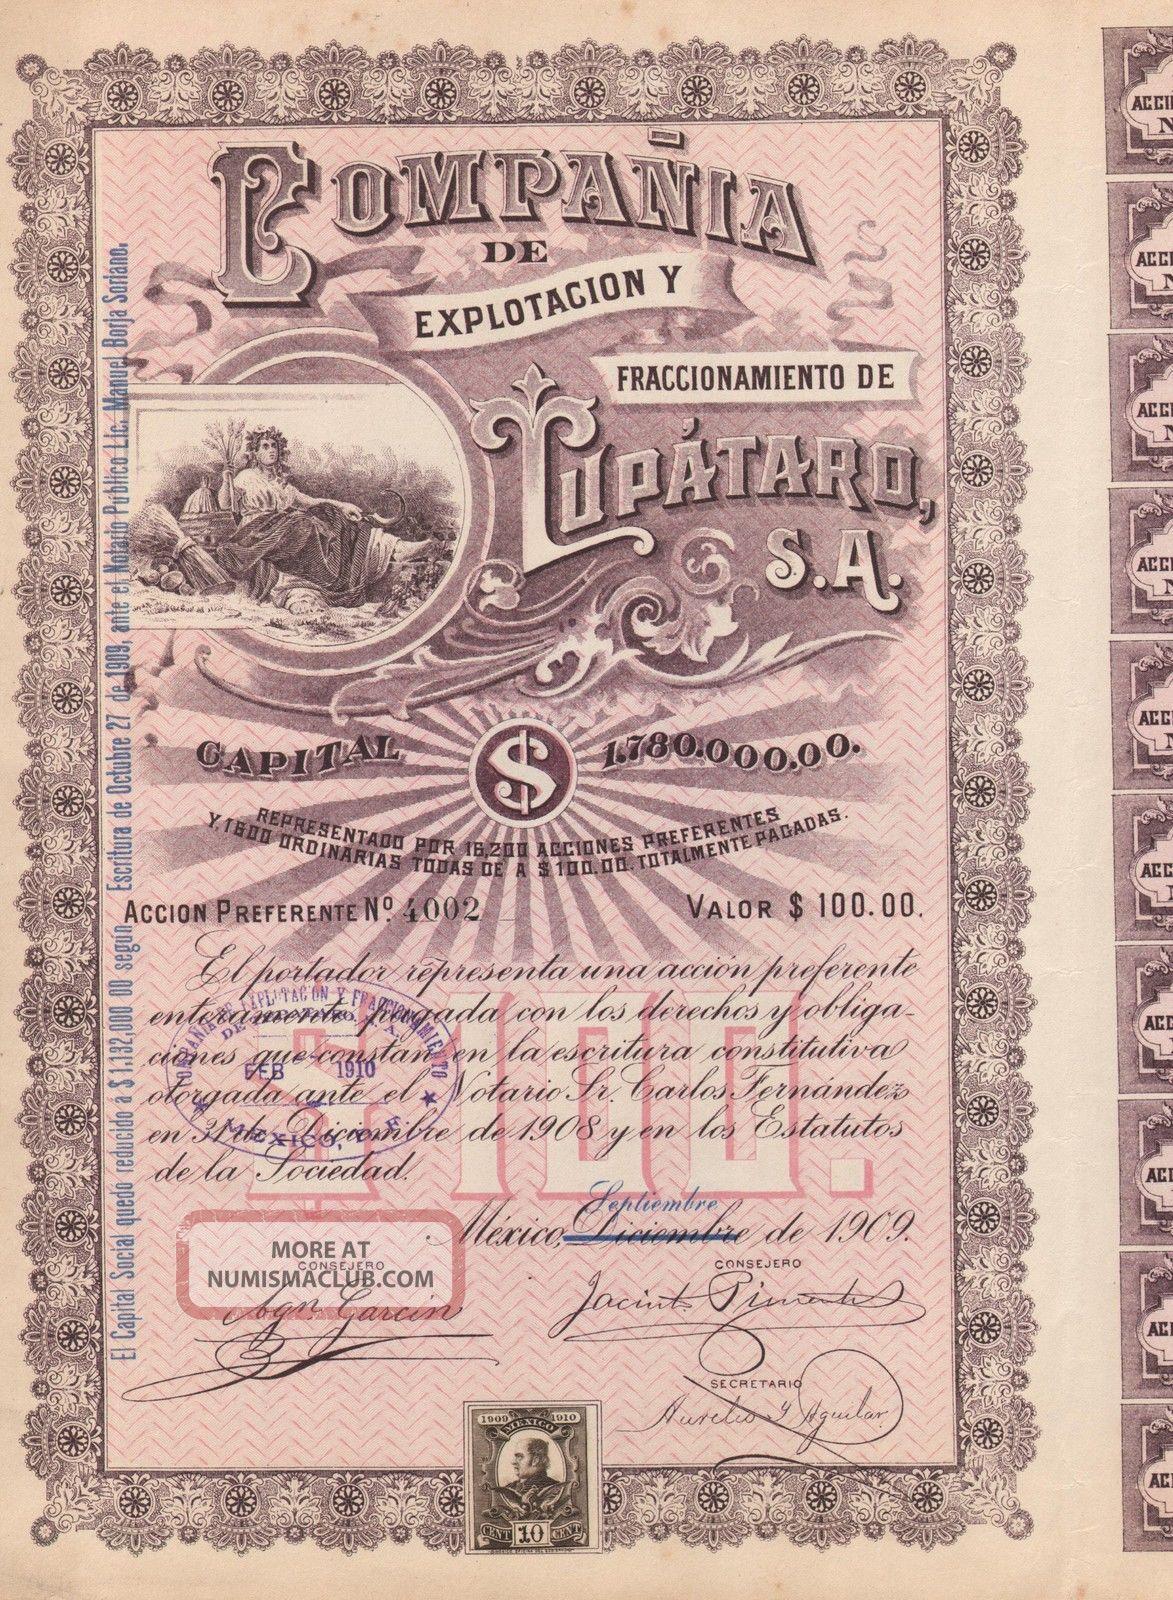 Mexico Compania De Explotacion Lupataro Bond Stock Certificate 1909 W/coupons World photo